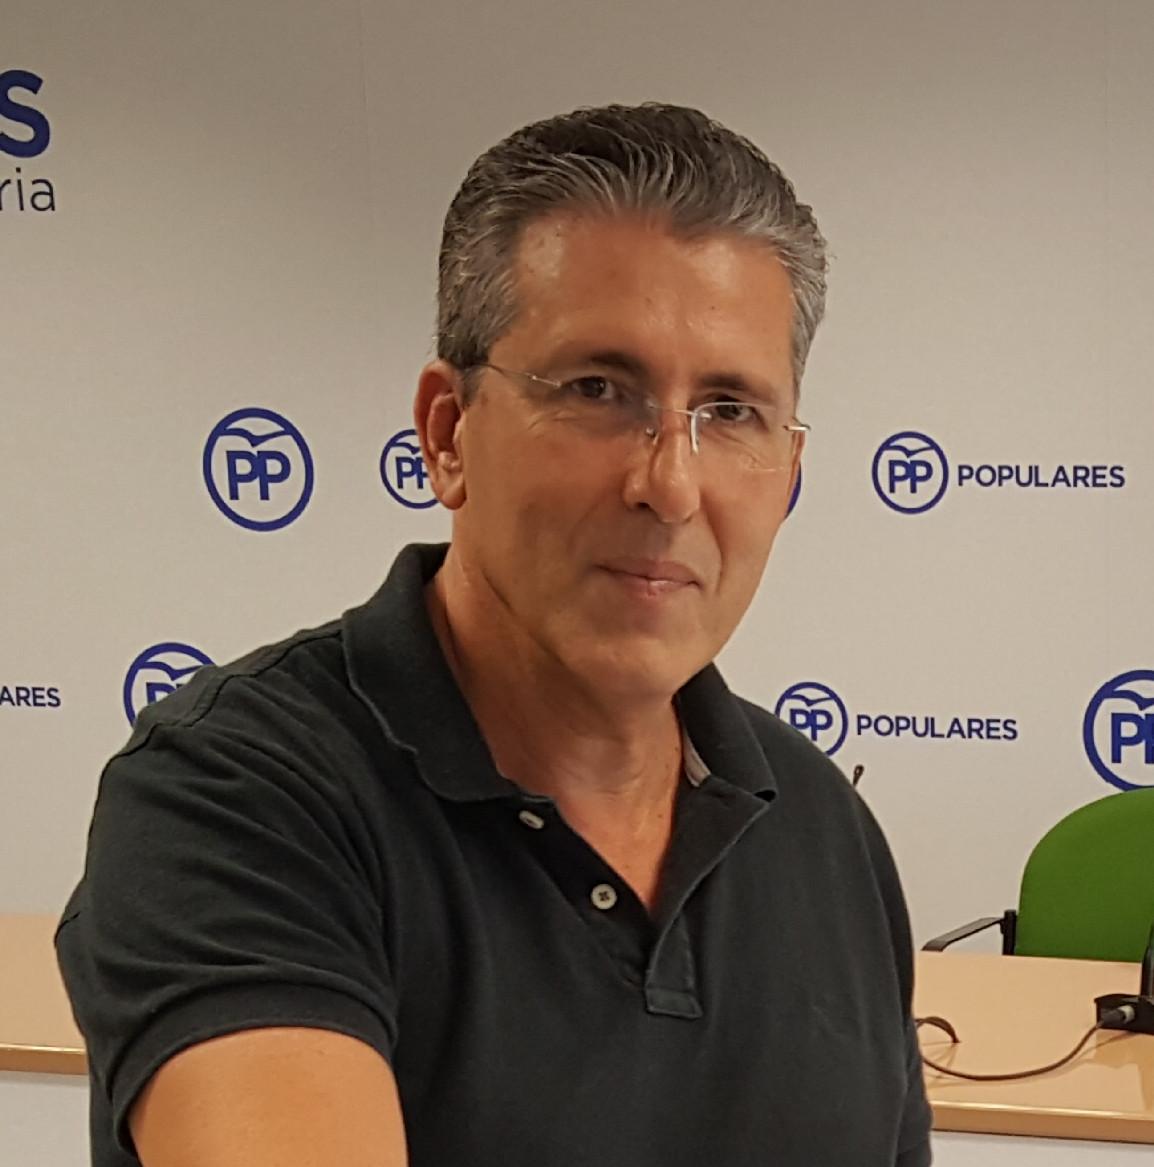 Joseu0301 Antonio Brito